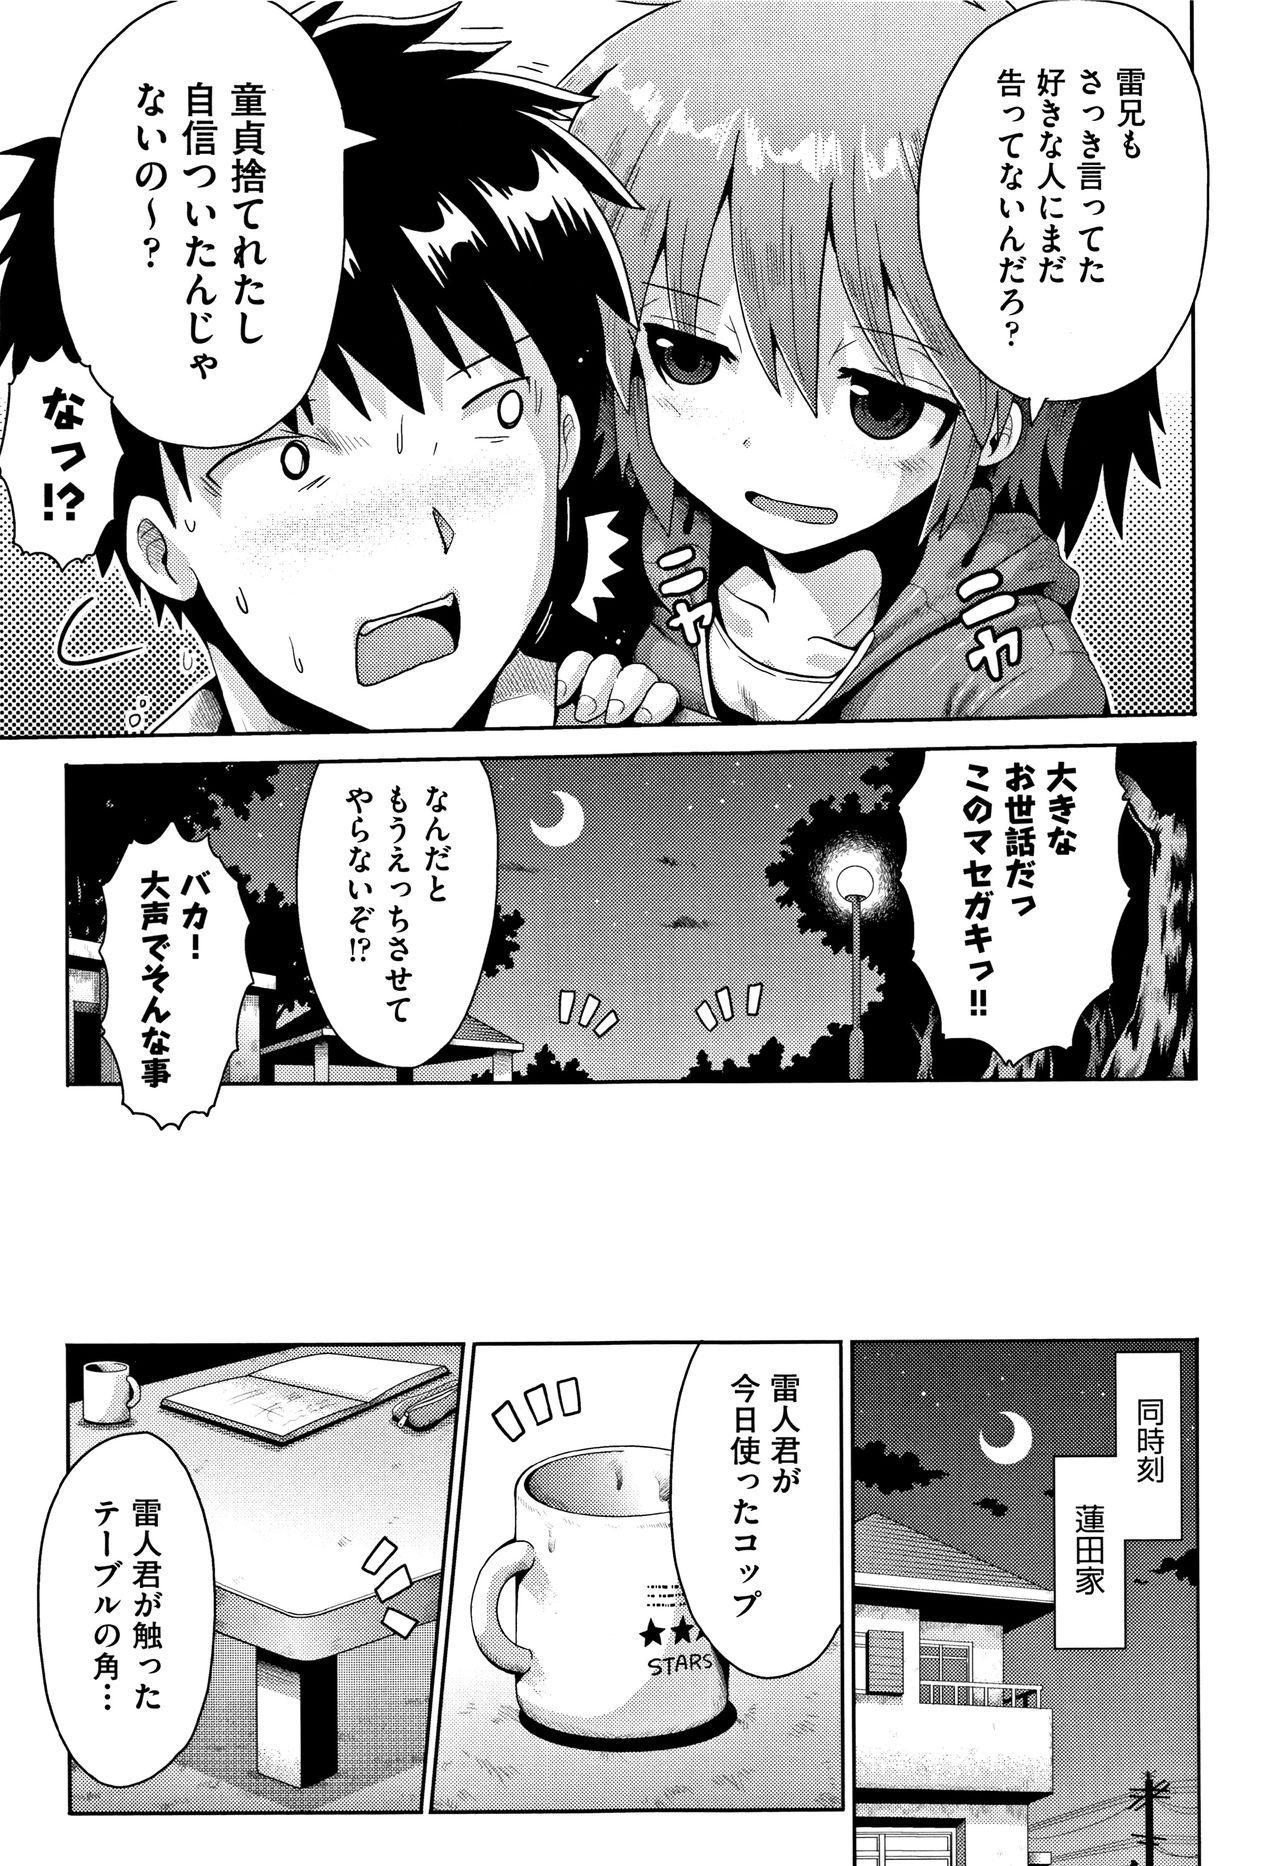 Kokugo Sansuu Rika Sex 29